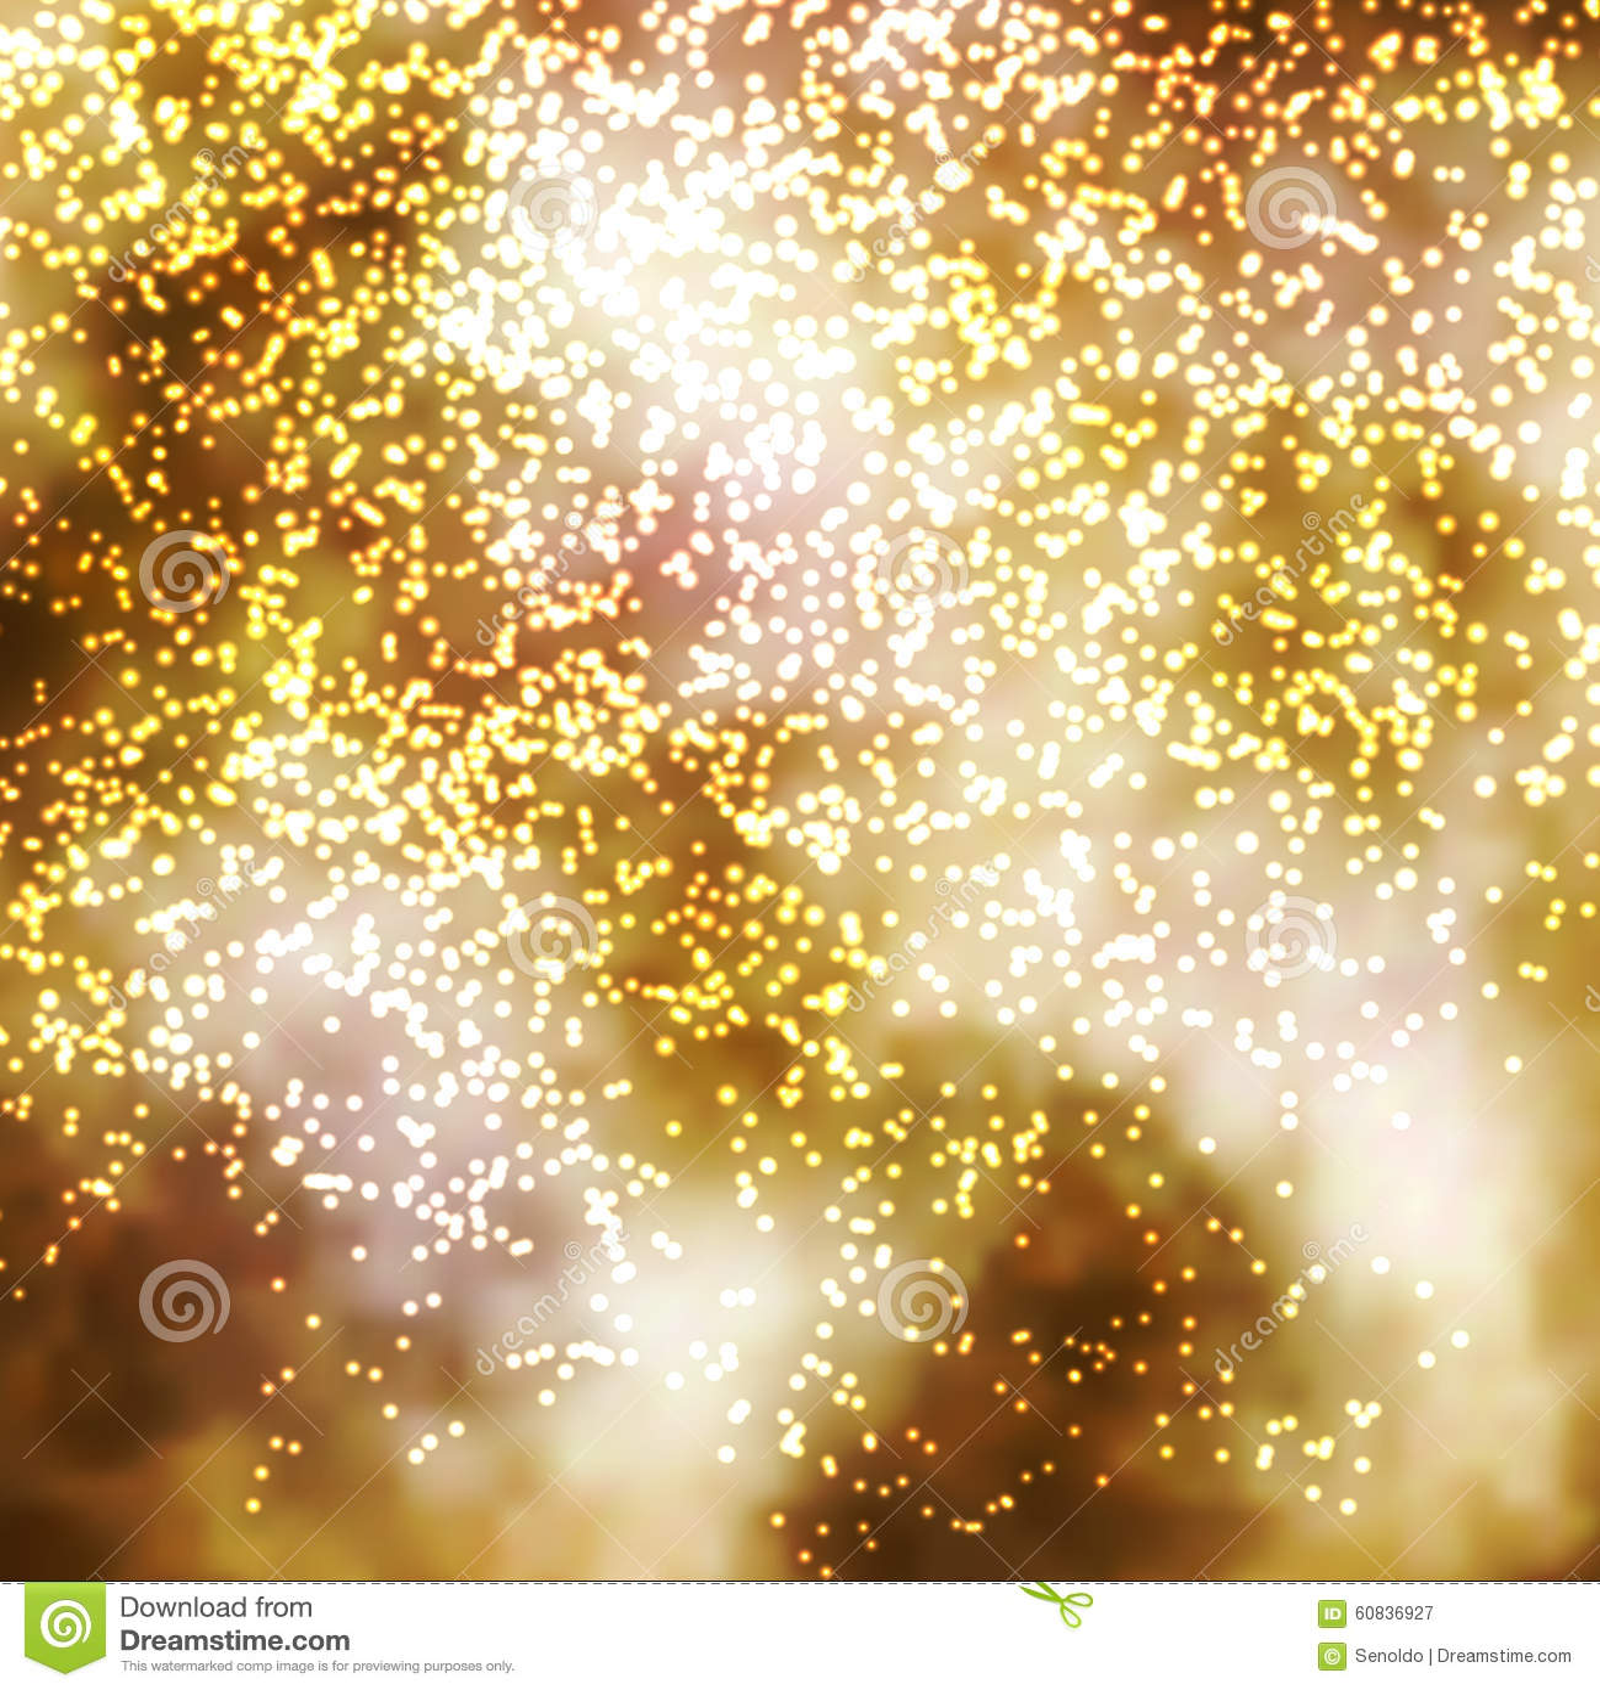 Golden Incandescent Glittering Particle Background Illustration ...